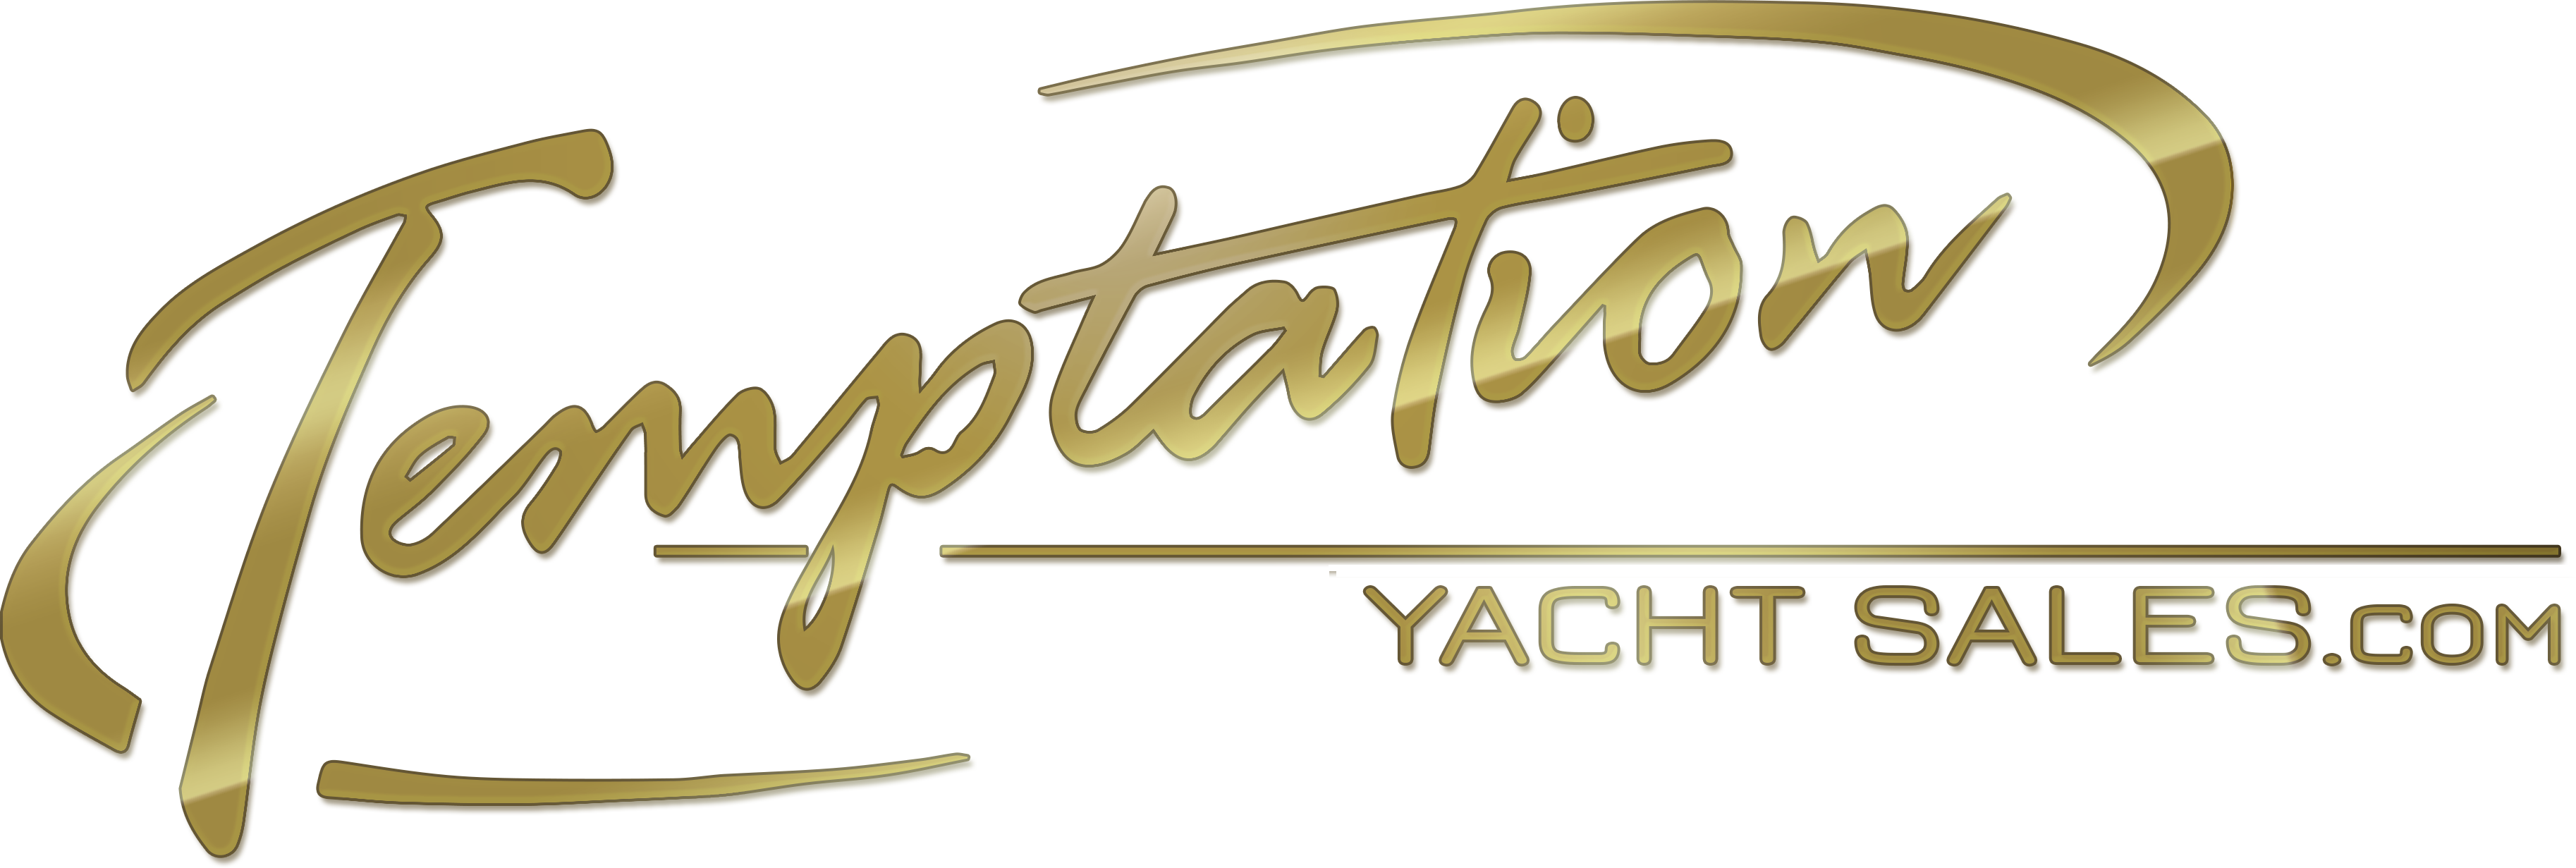 Temptation Yacht Sales Inc logo